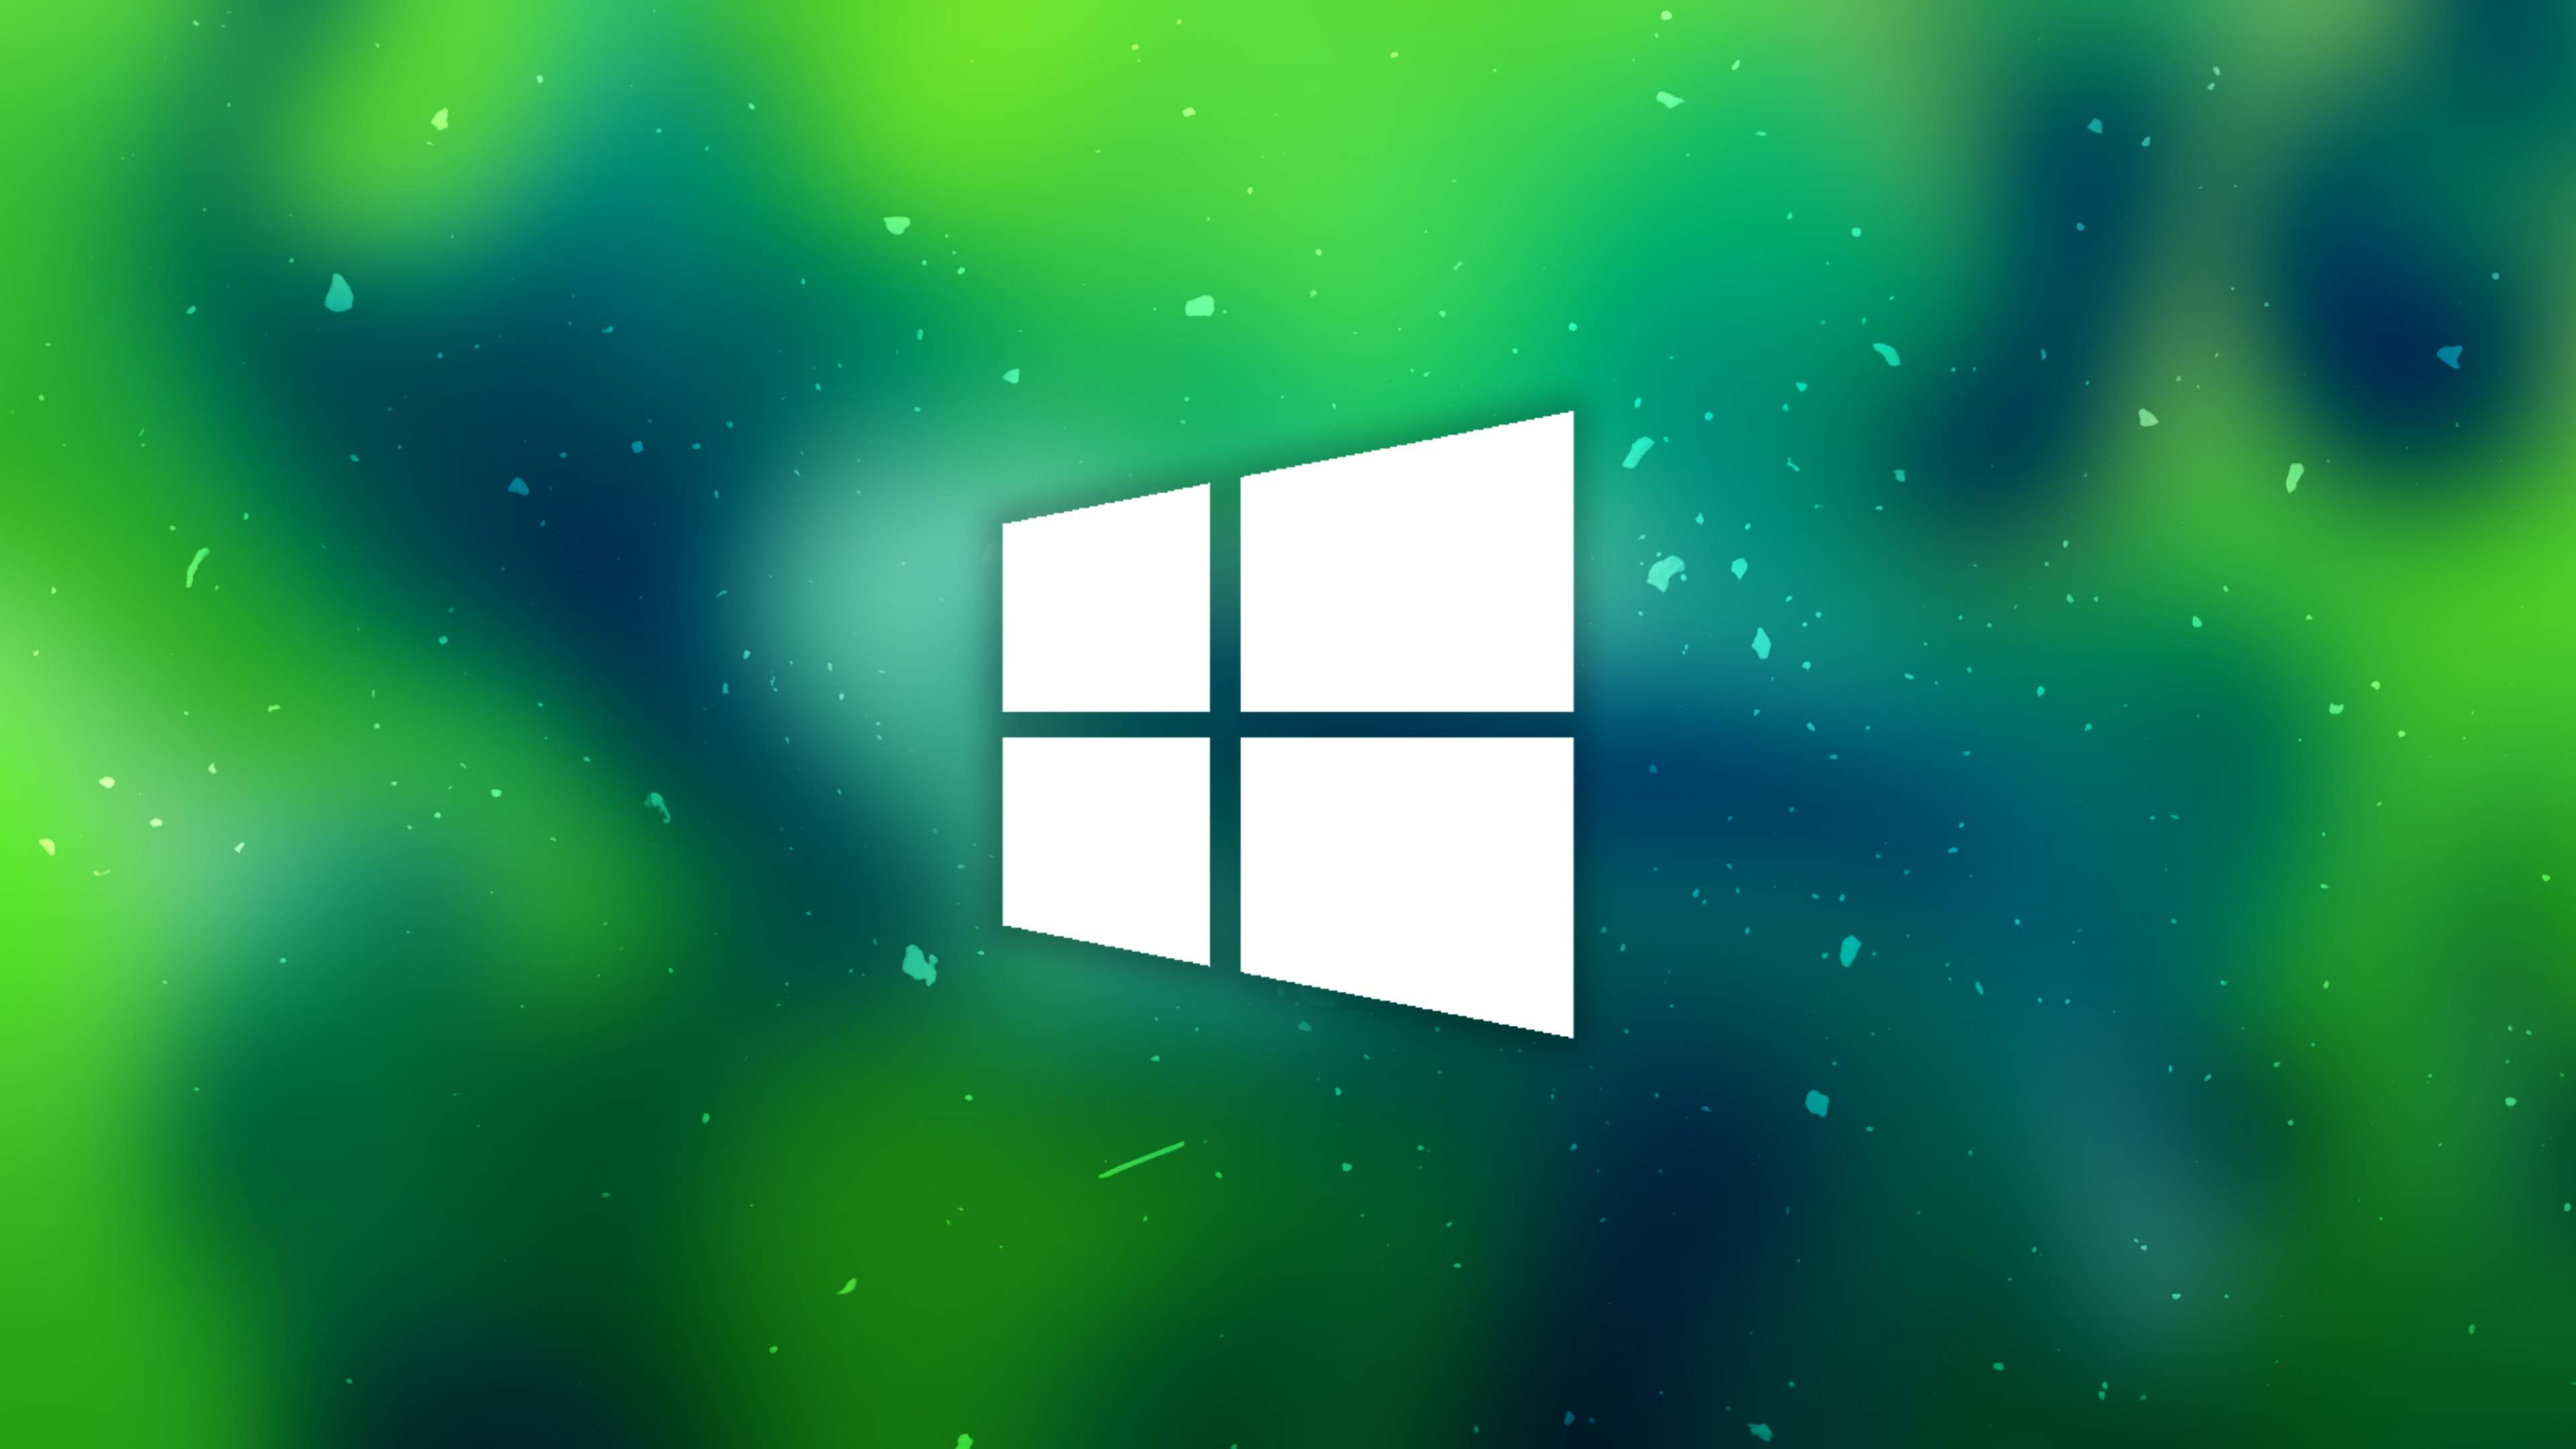 4k Windows 10 Wallpaper For Pc Art 2019 Wallpaper Windows 10